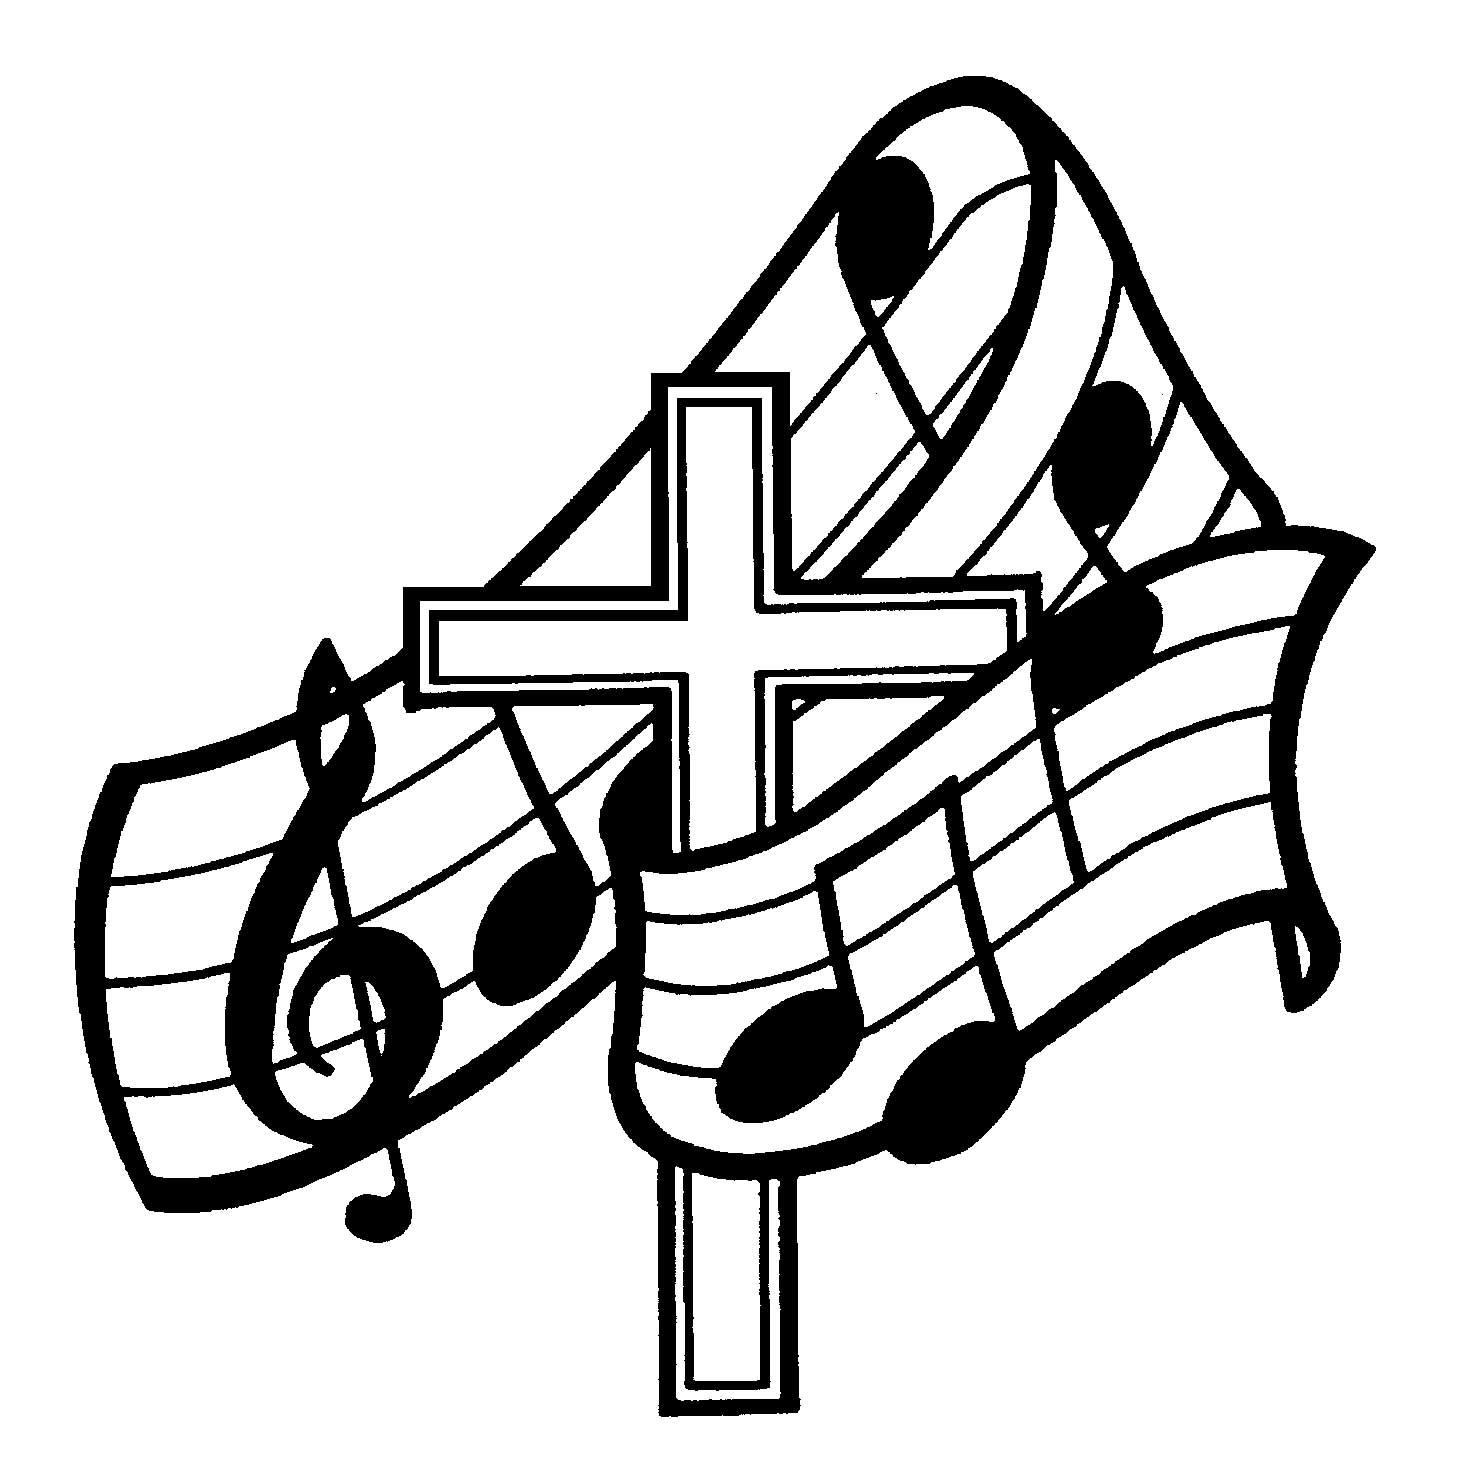 OCR FM Praise & Worship | OCR FM Community Radio Station